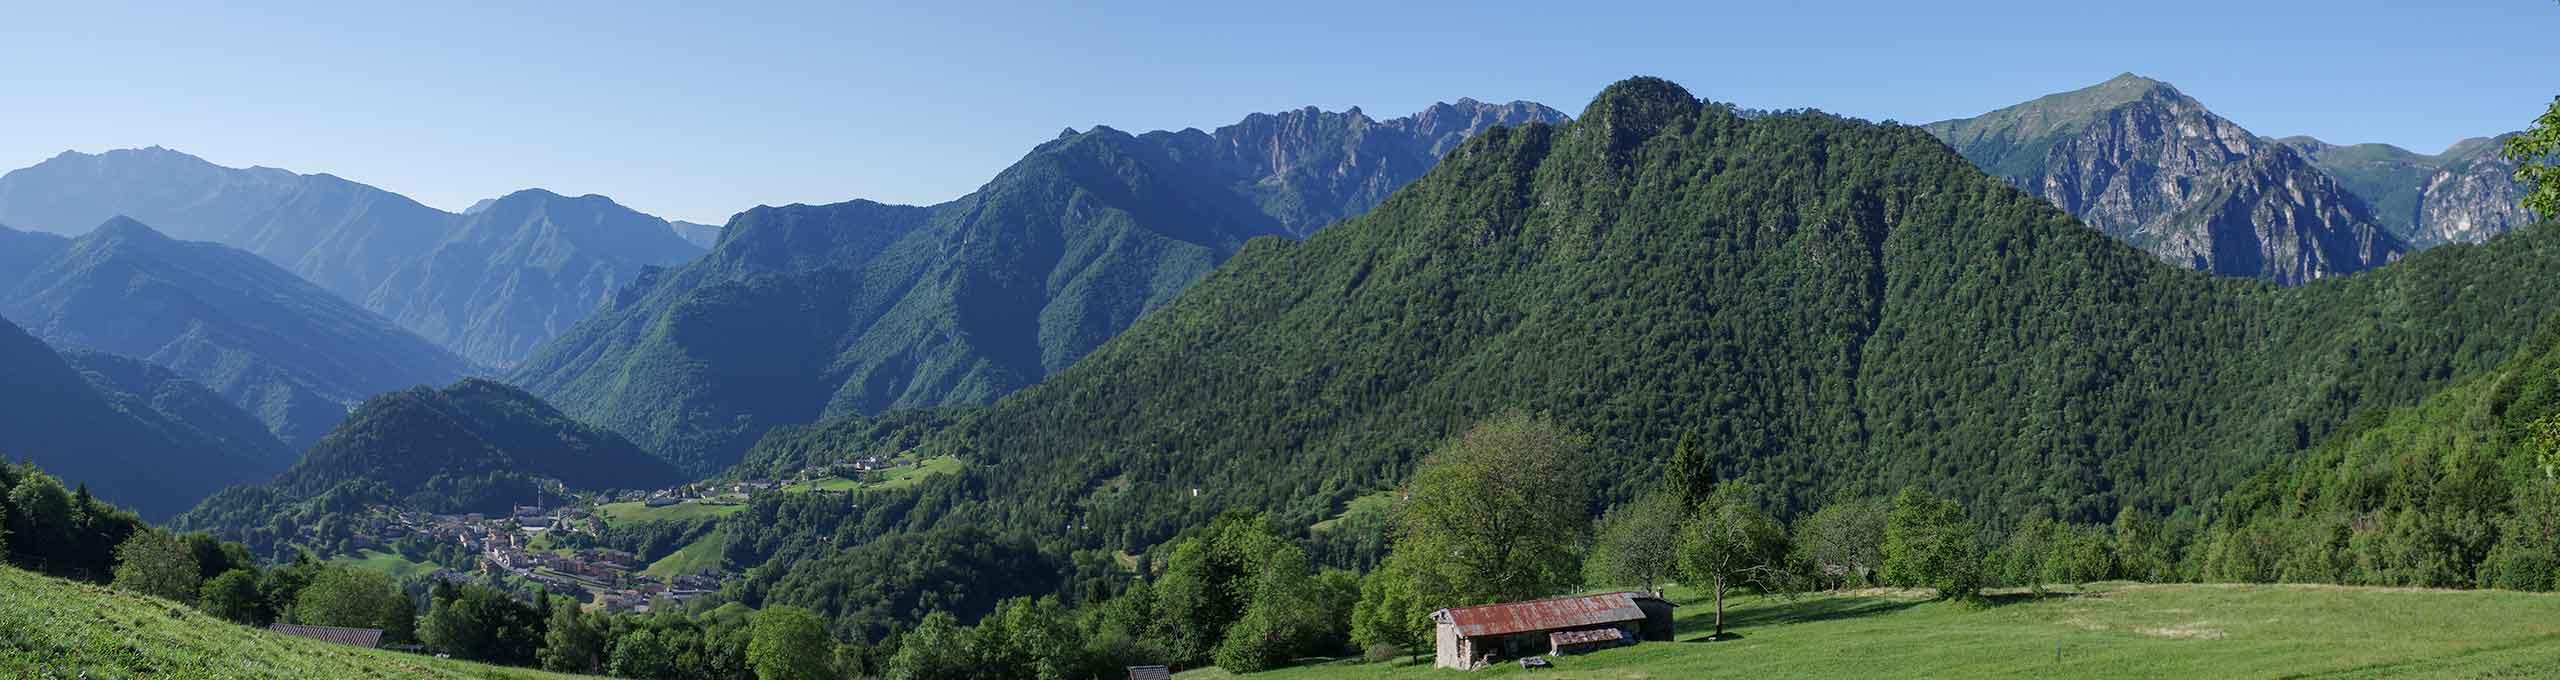 Cusio, Val Brembana